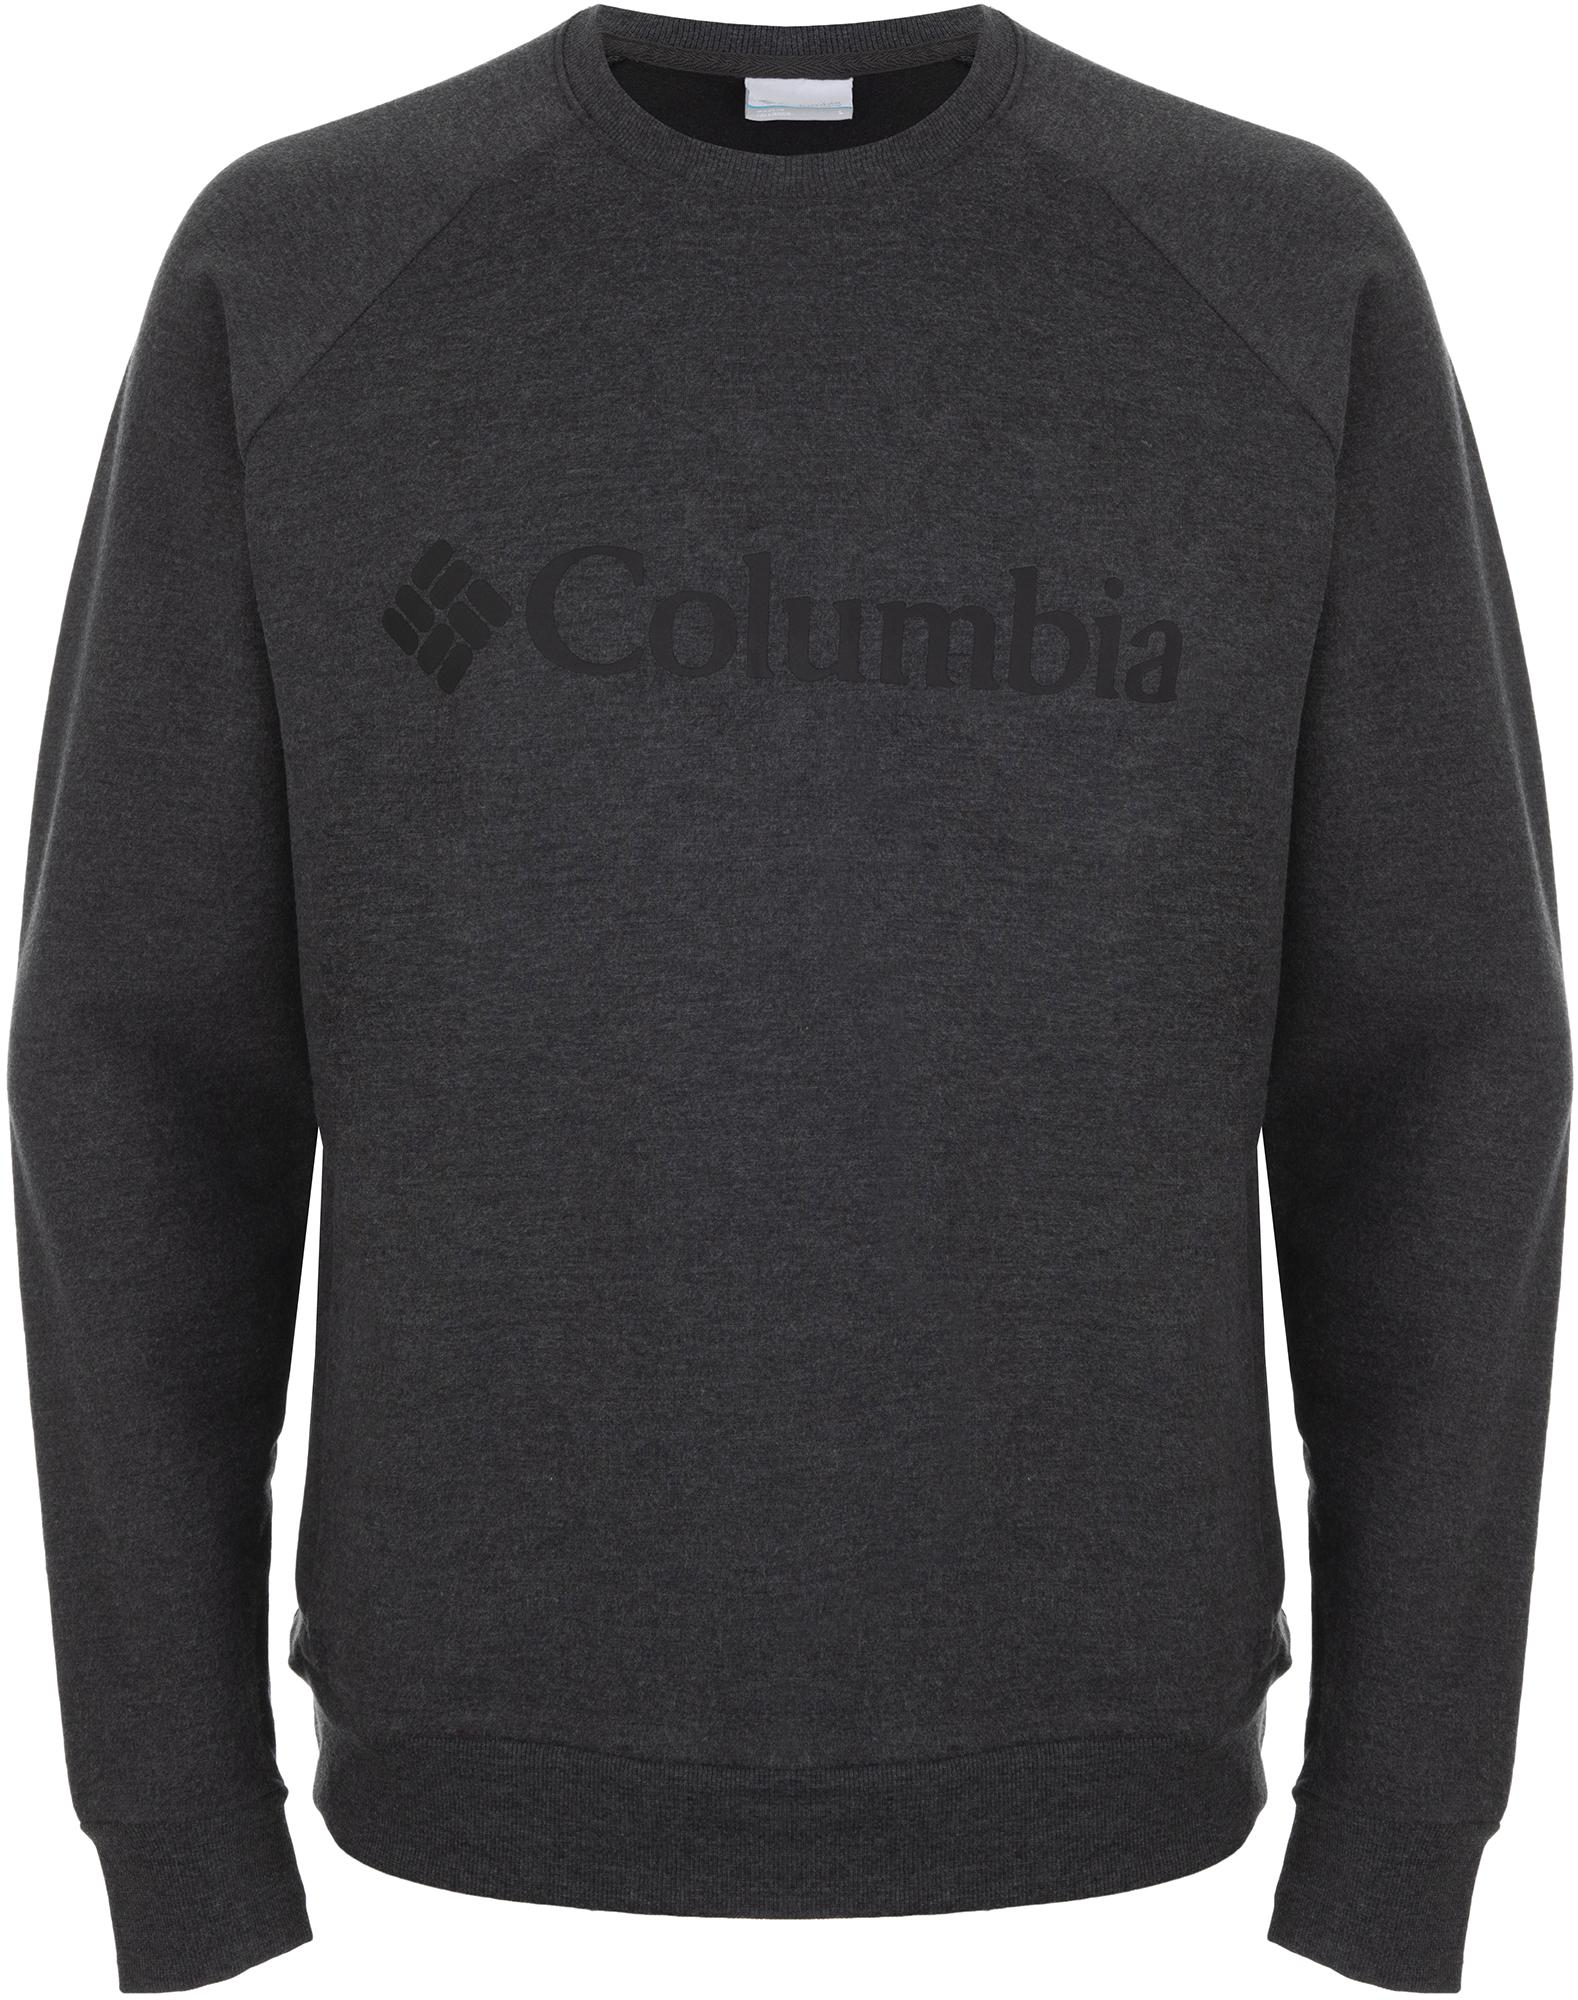 Columbia Свитшот мужской Columbia Lodge, размер 56-58